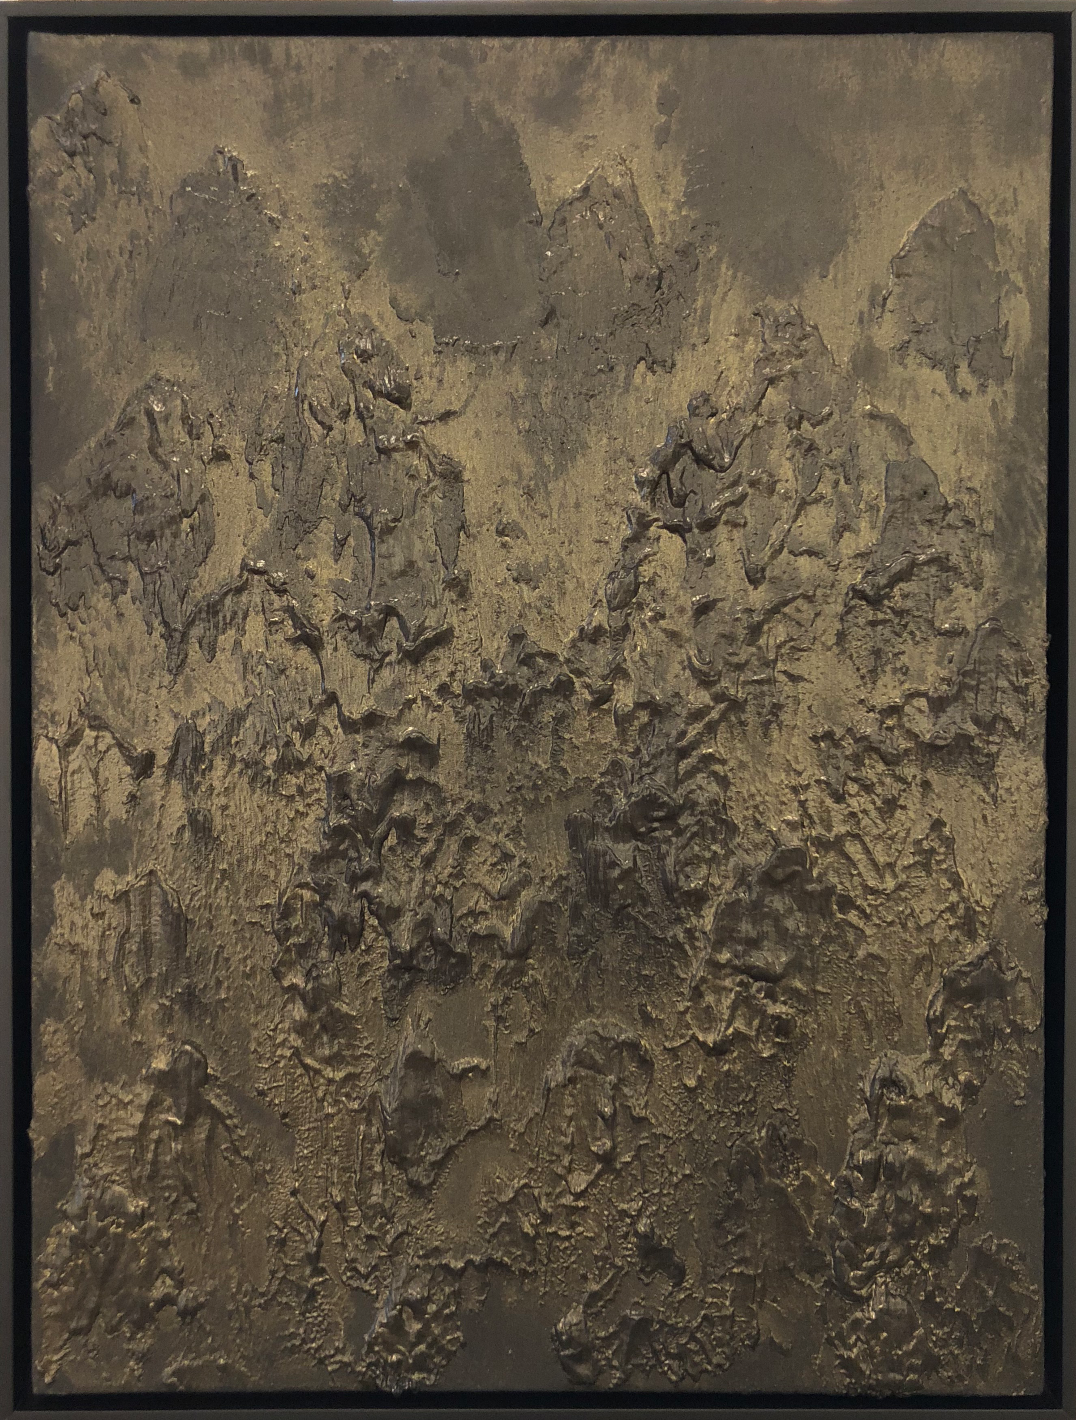 Matthew C. Metzger, American Darkness II  Oil, Iron, Bronze on Canvas, 25x19 in.